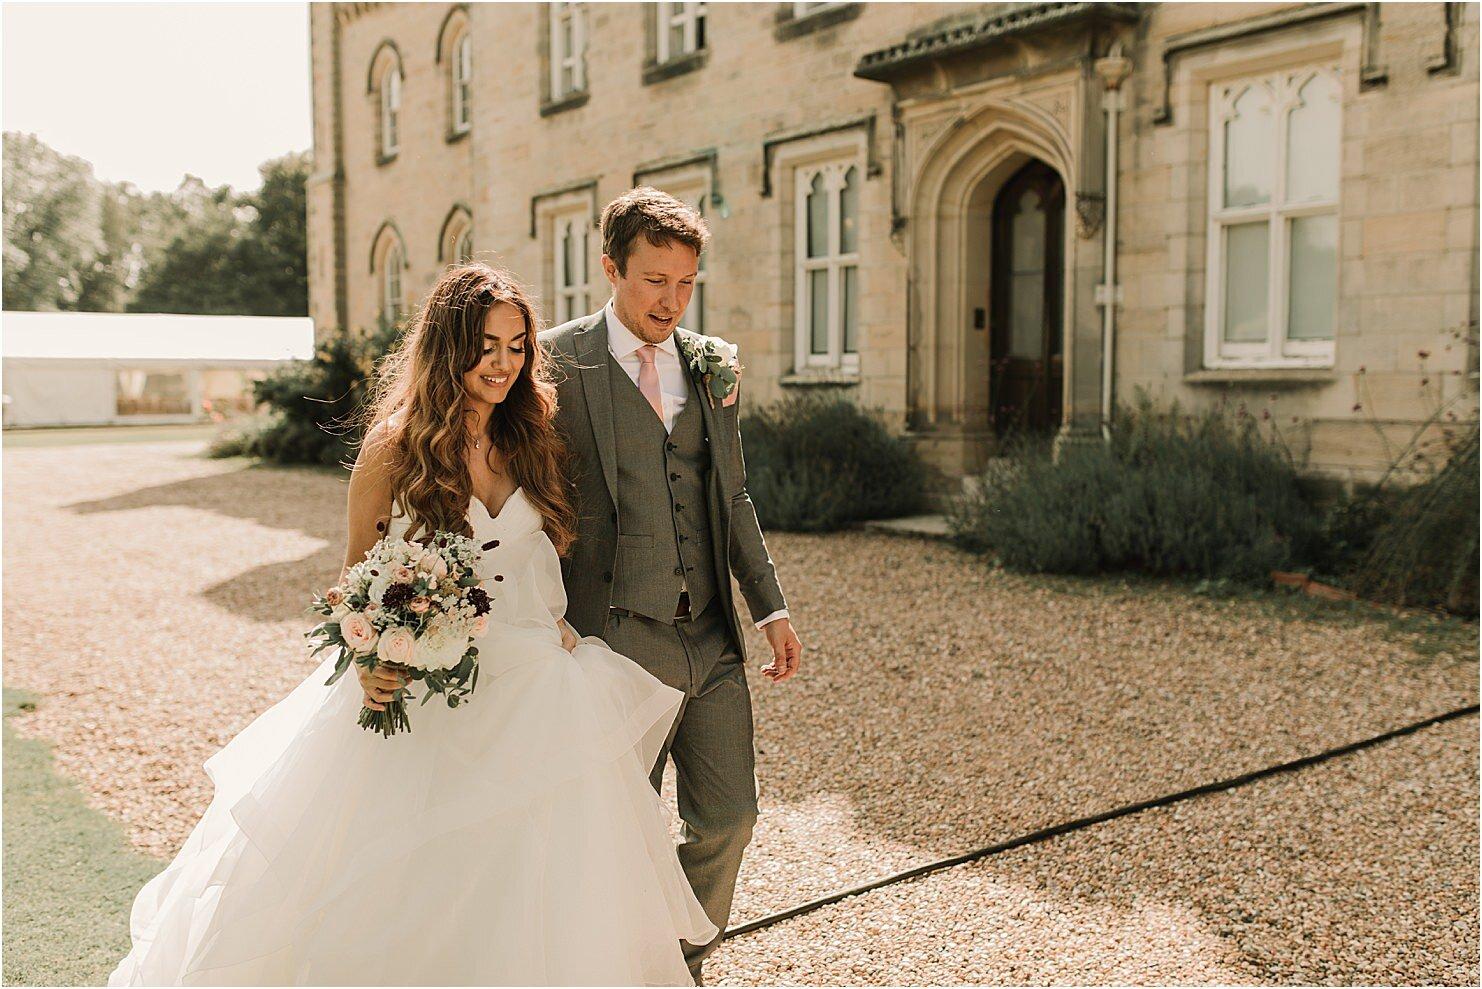 boda-de-cuento-en-castillo-boda-en-londres-62.jpg